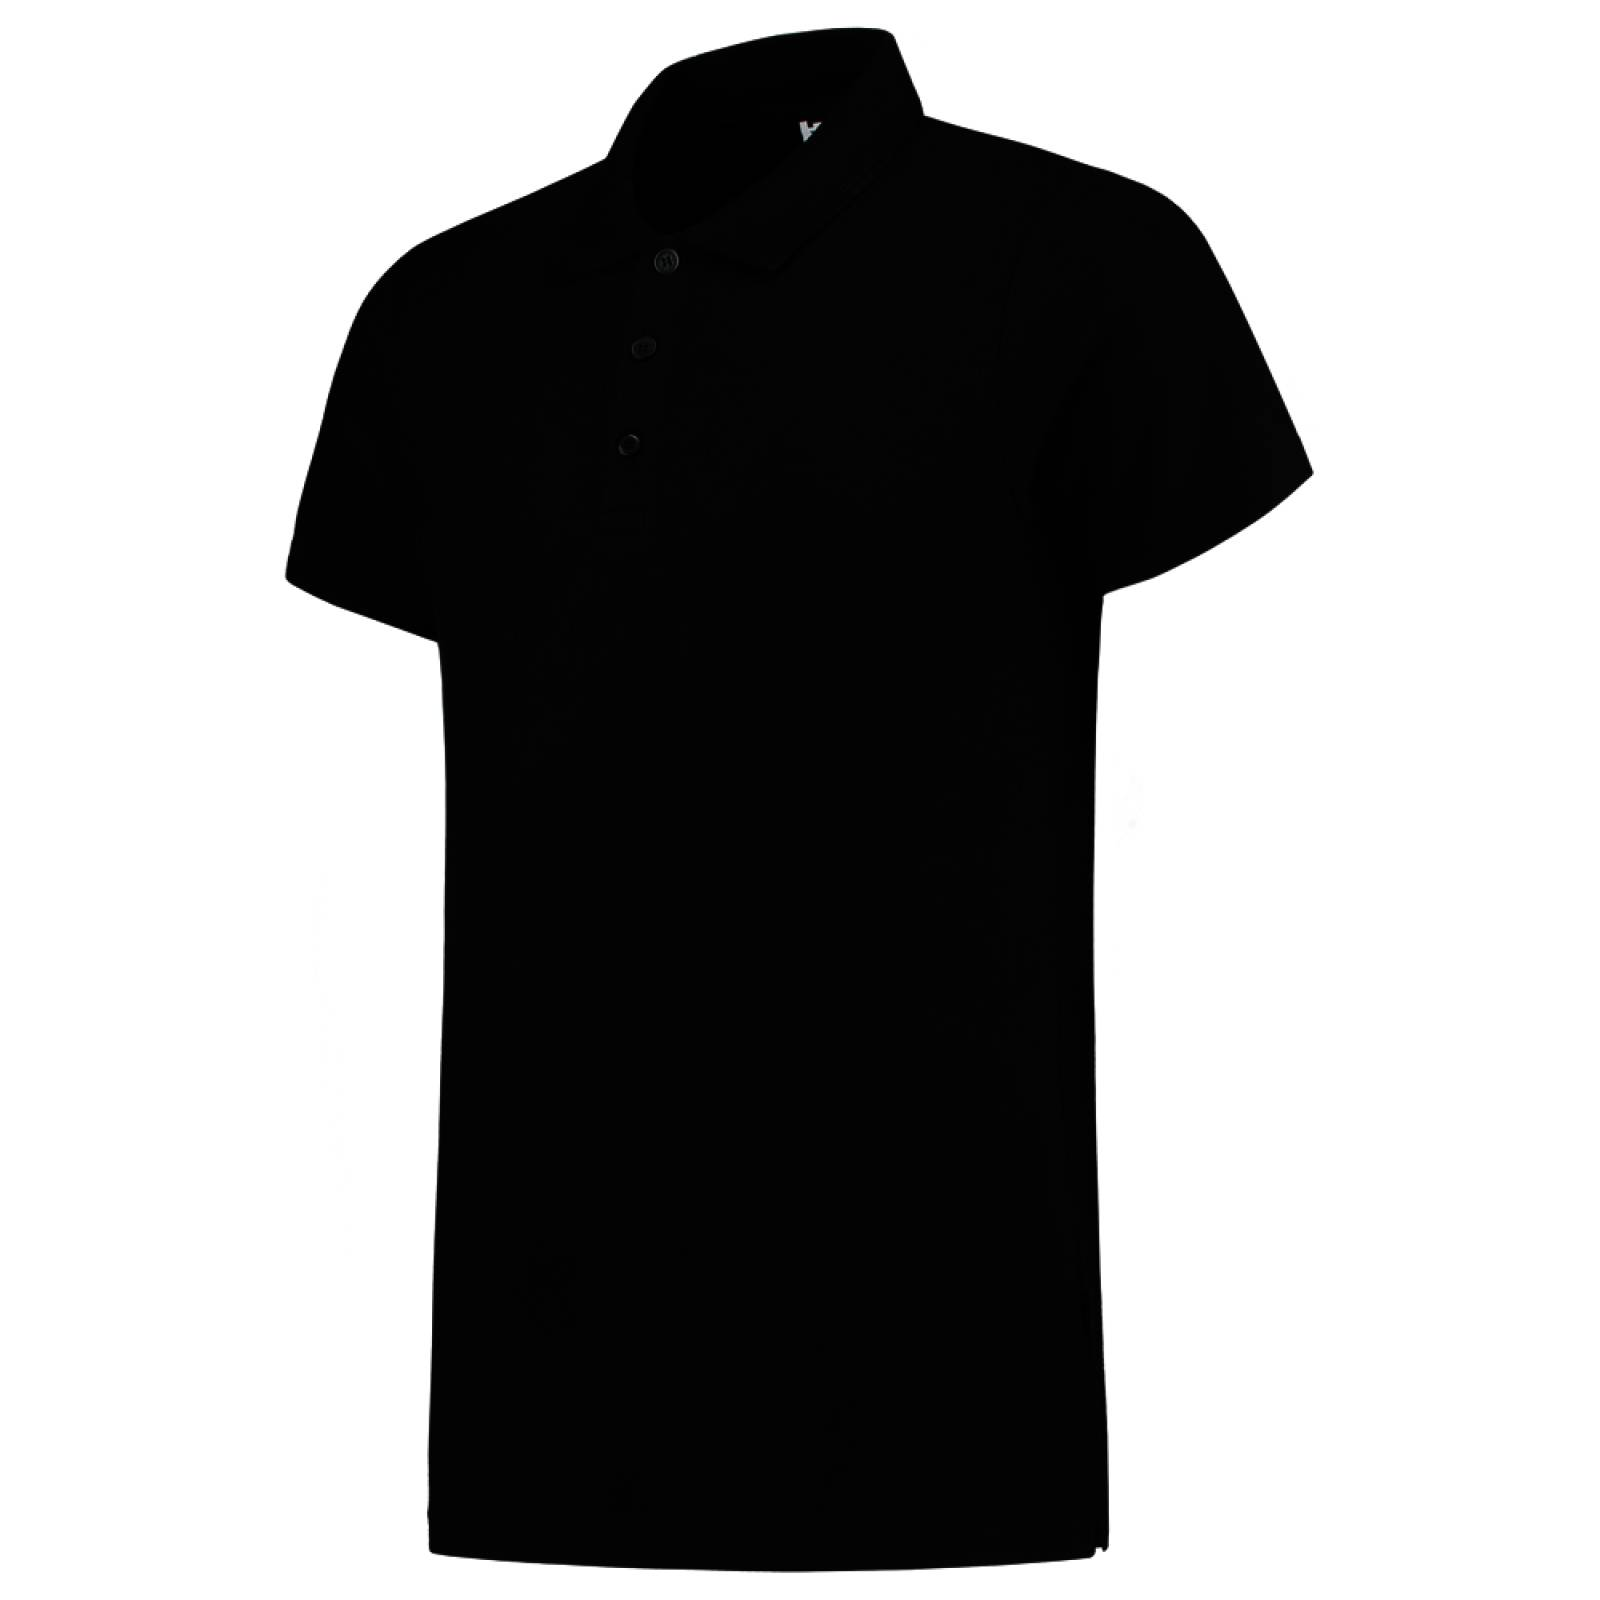 Tricorp Casual Poloshirts 201005-PPF180 zwart(Black)